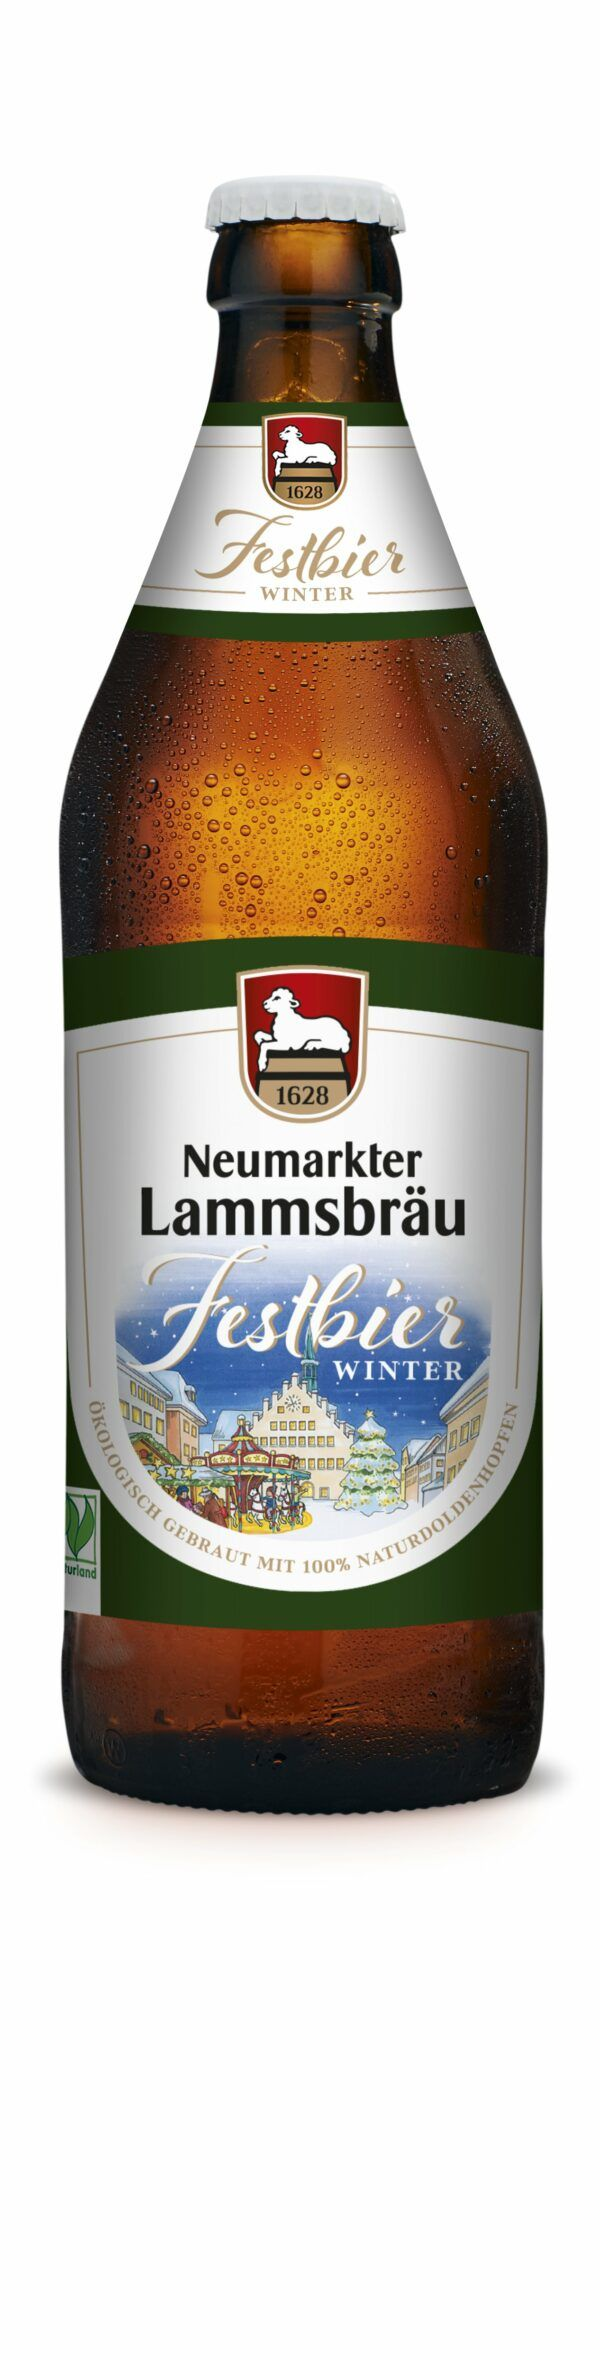 Neumarkter Lammsbräu Lammsbräu Winterfestbier (Bio) 0,5l